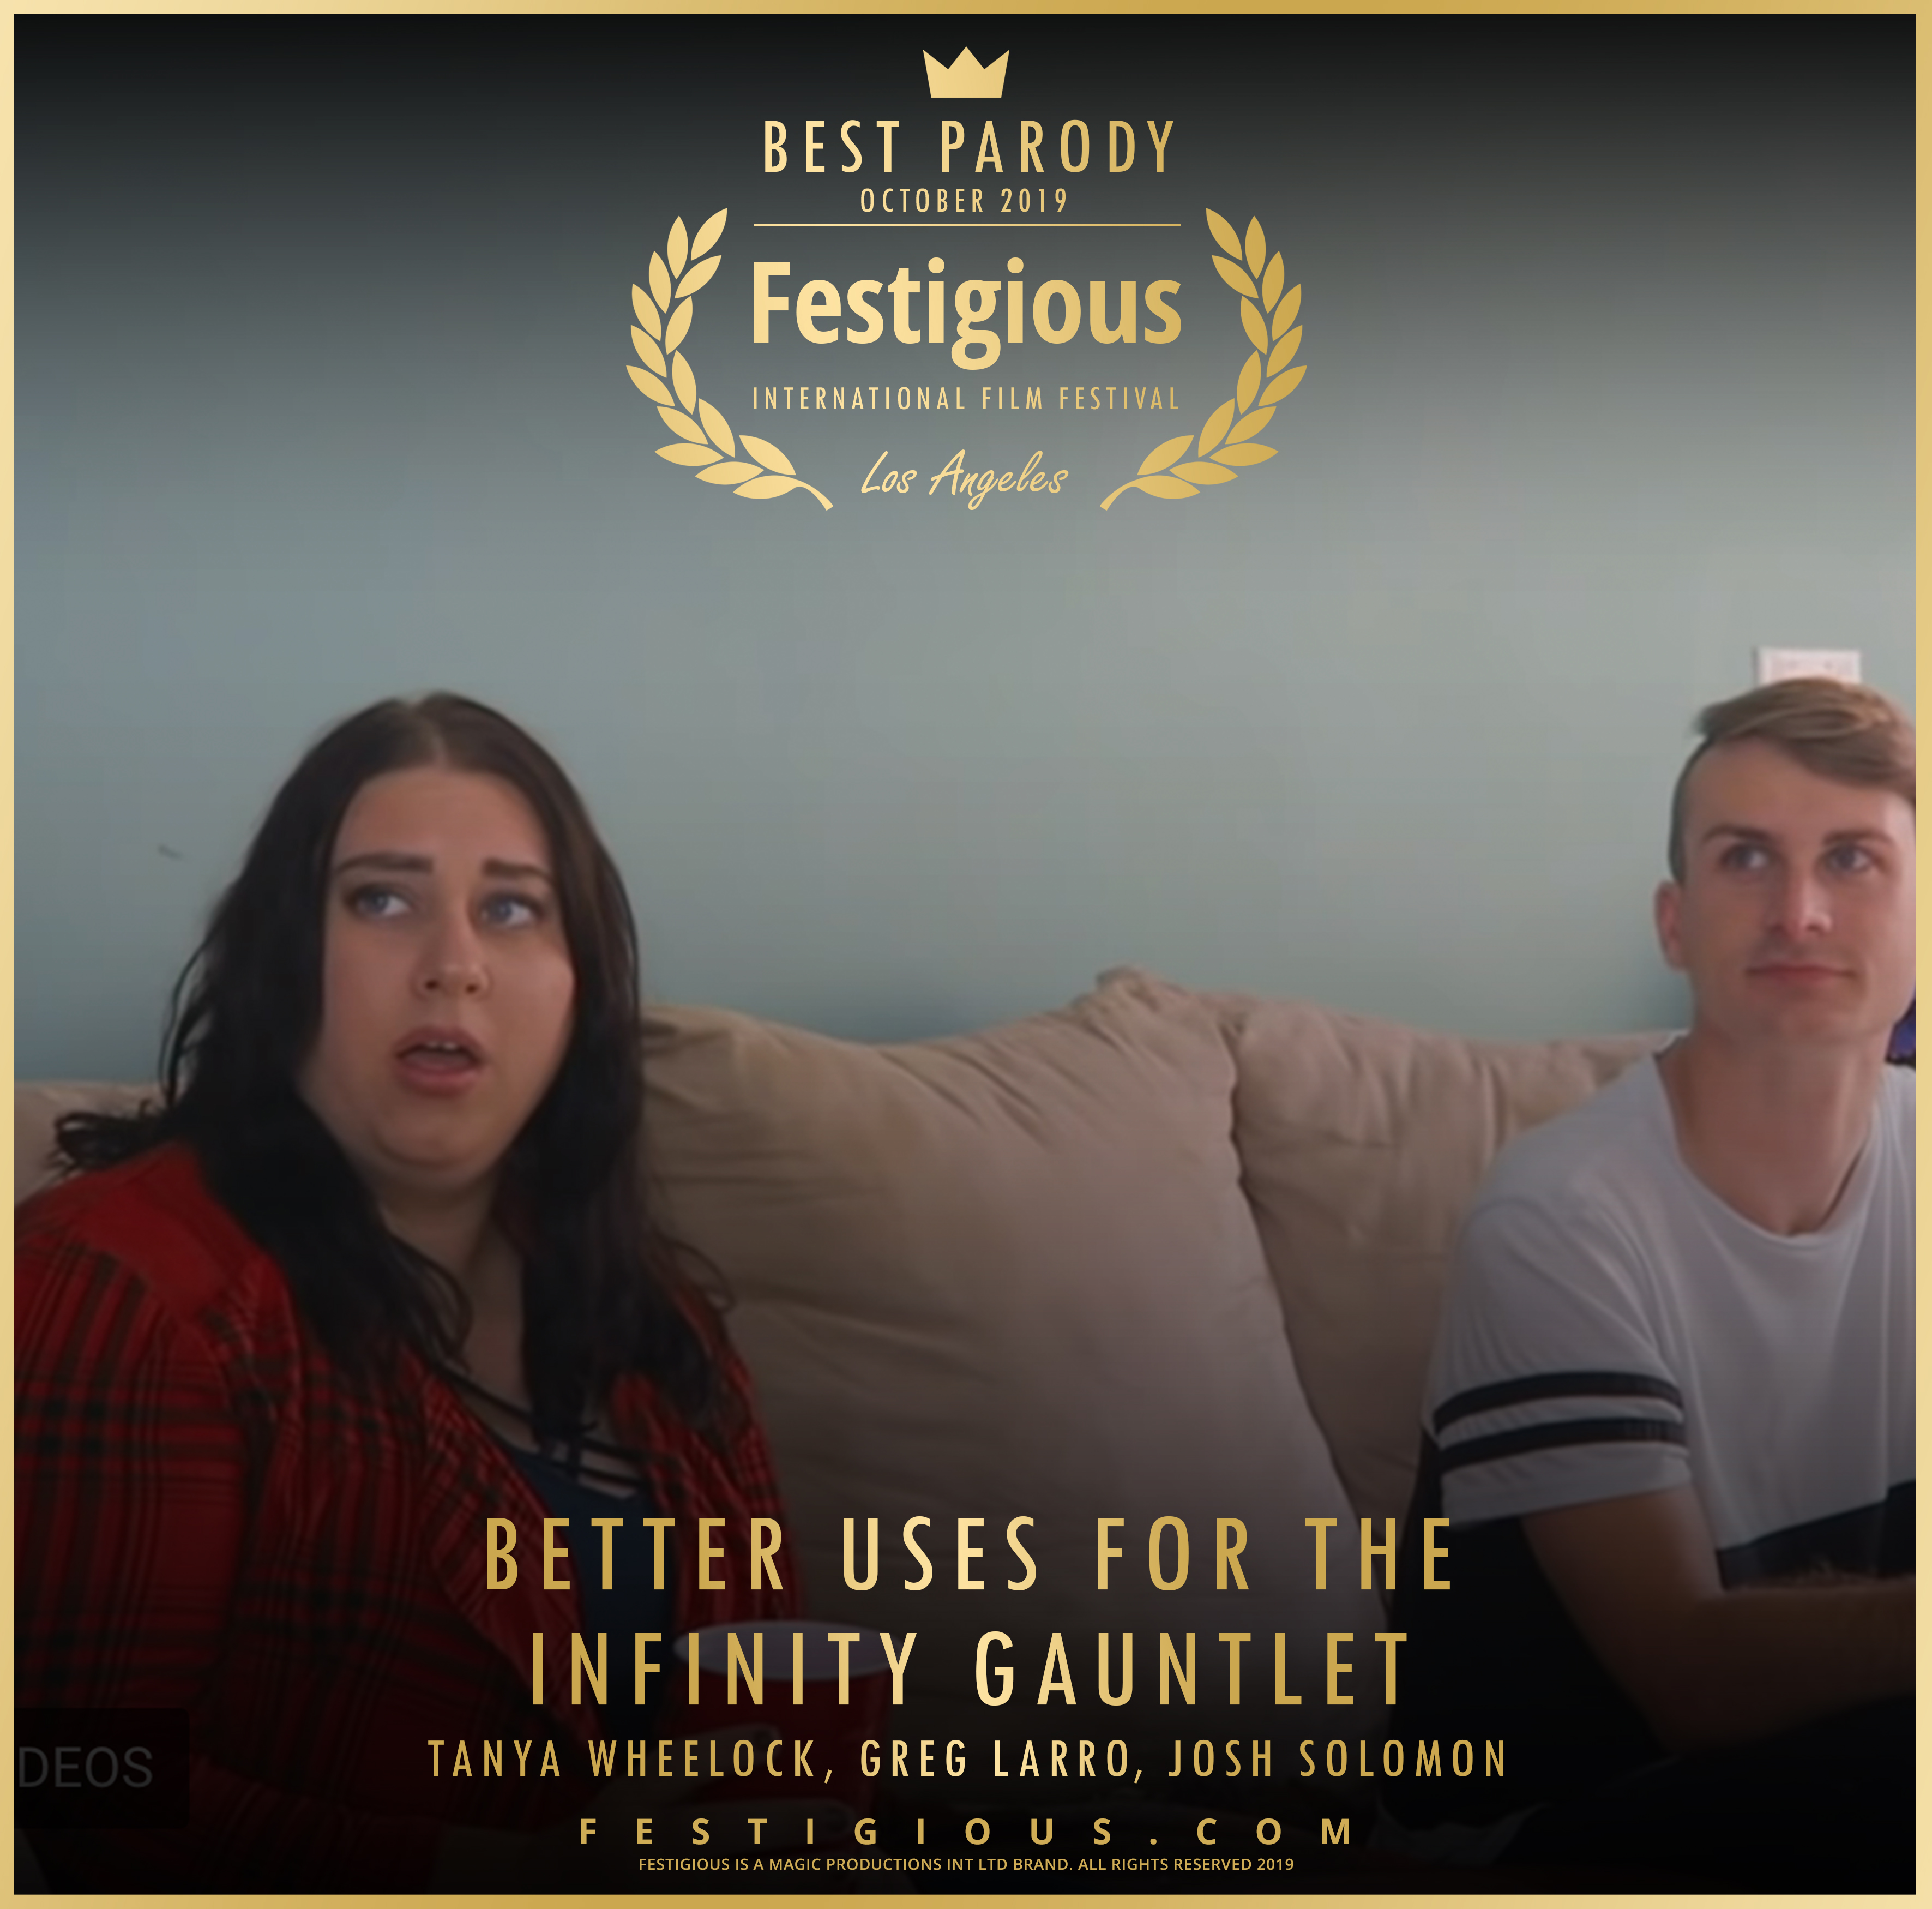 Better Uses for the Infinity Gauntlet de